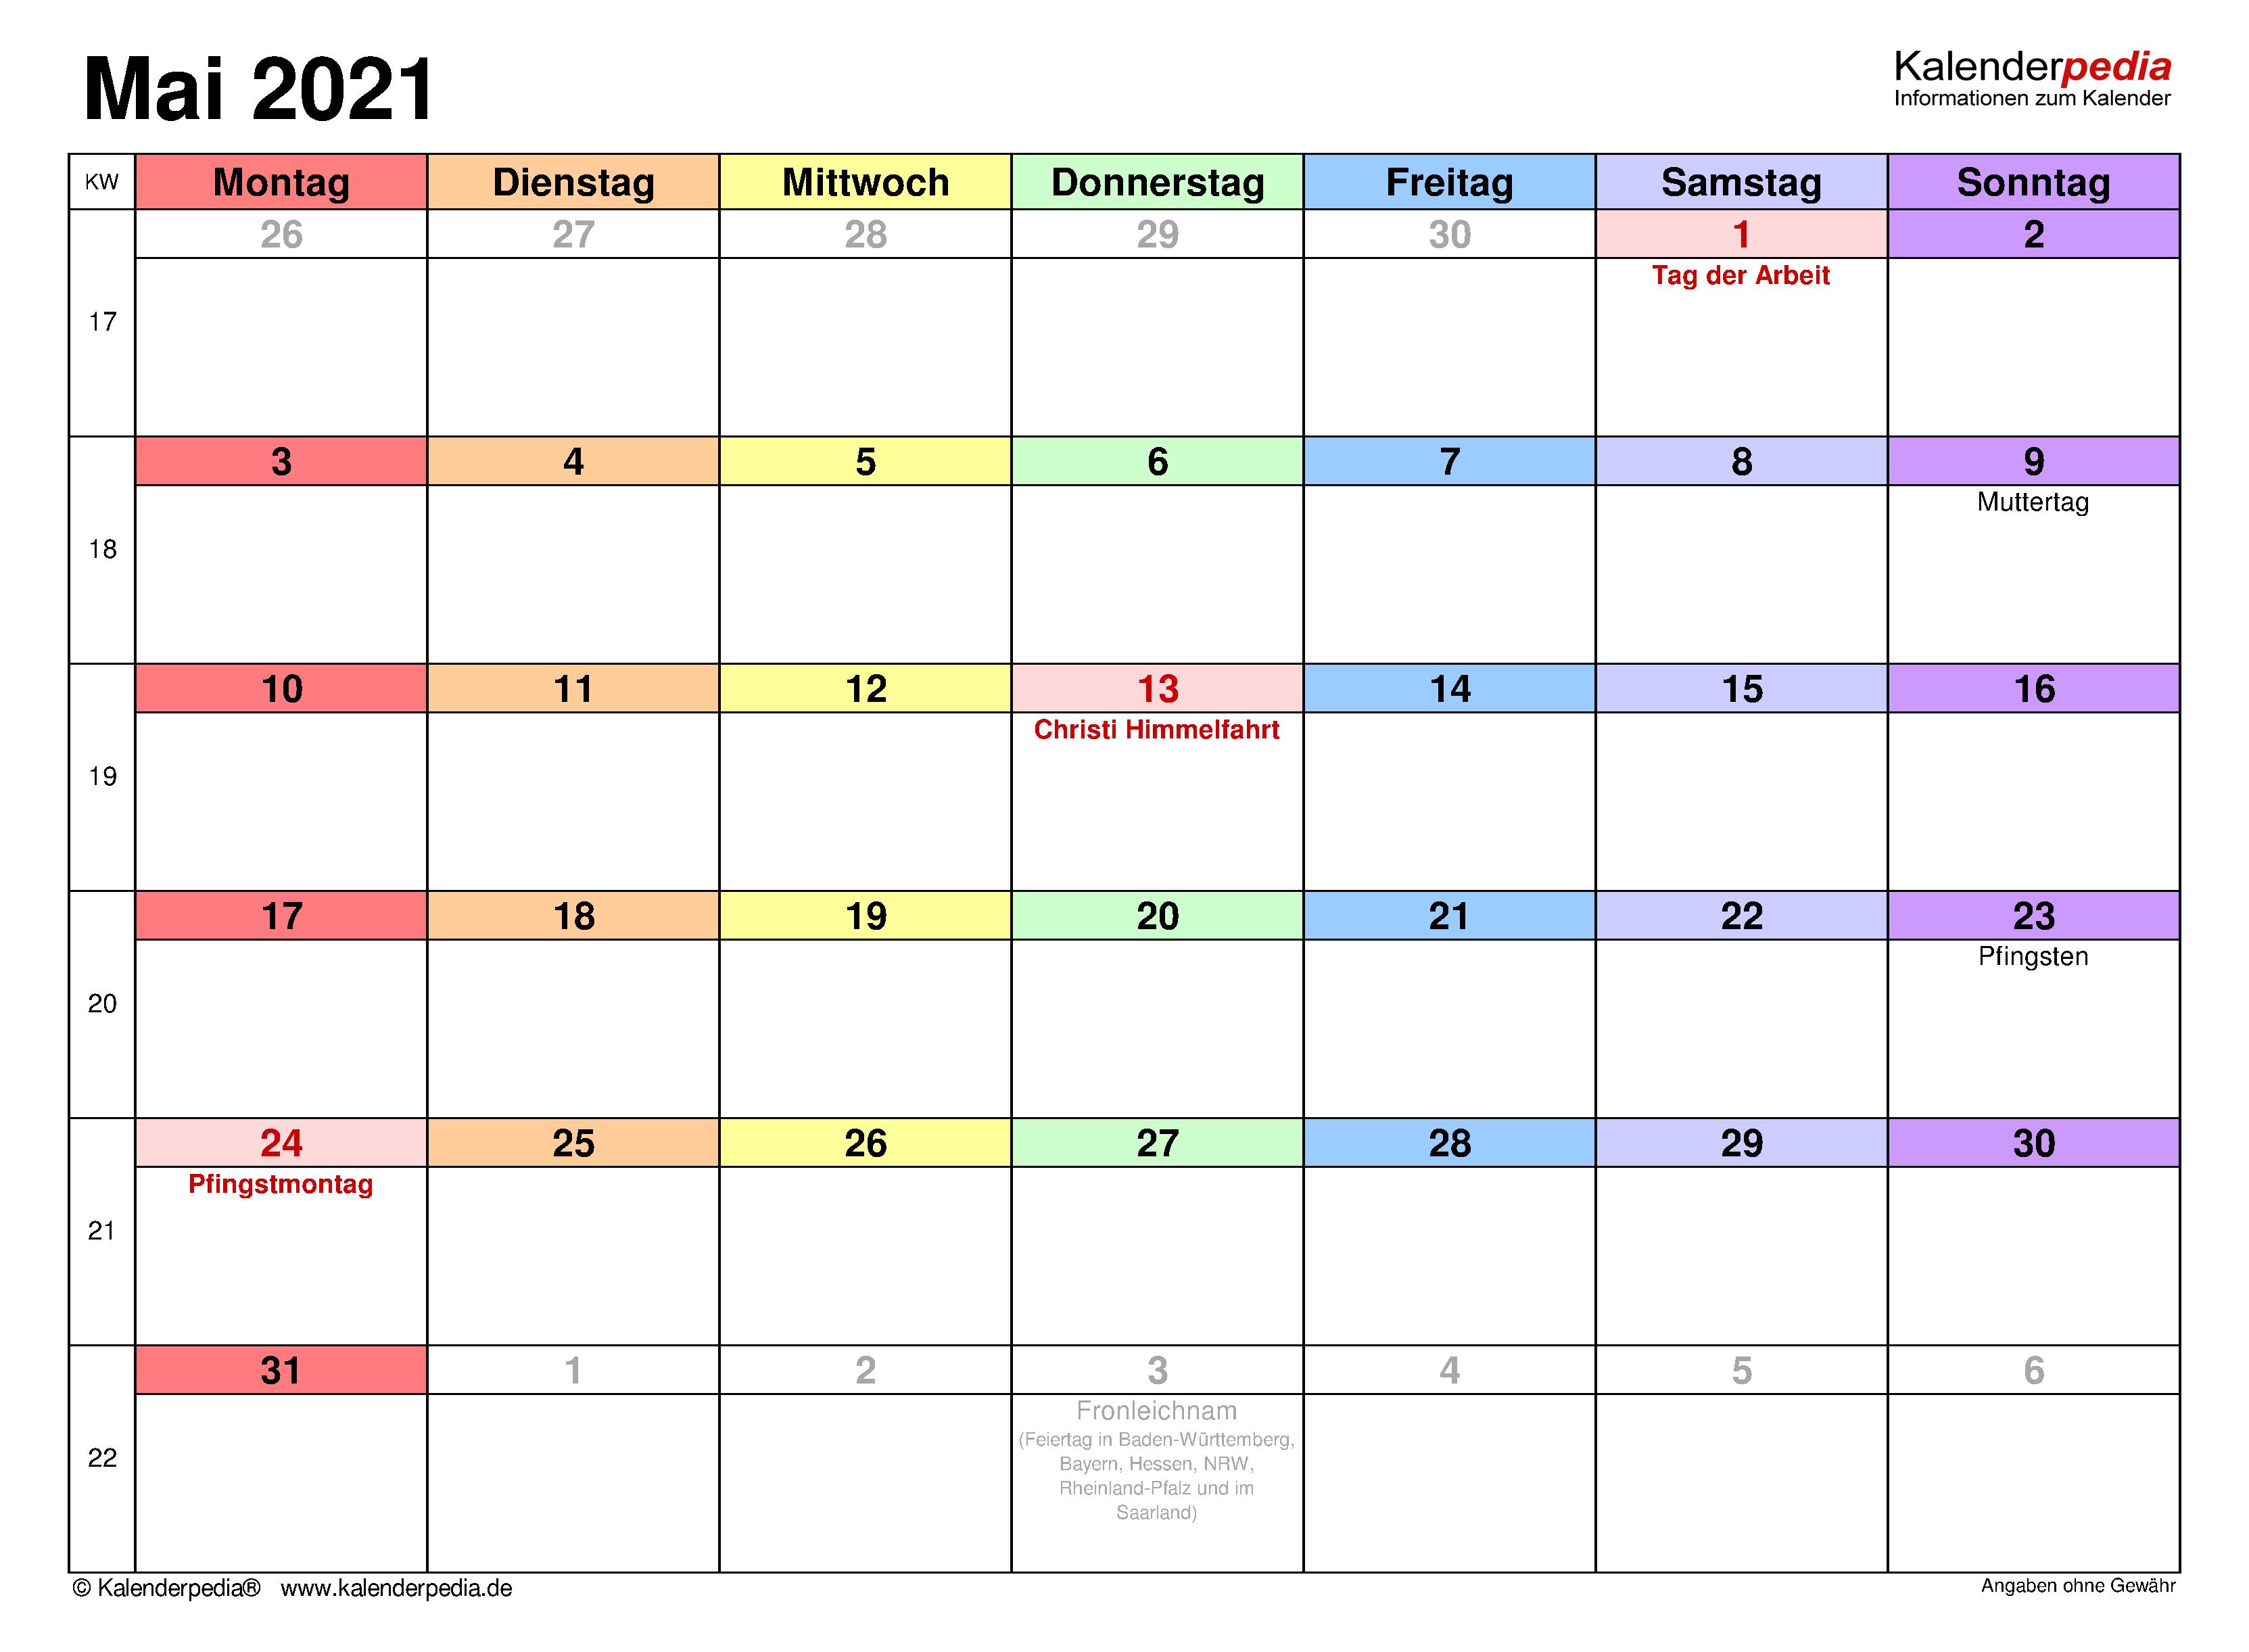 Wettertrend Mai 2021